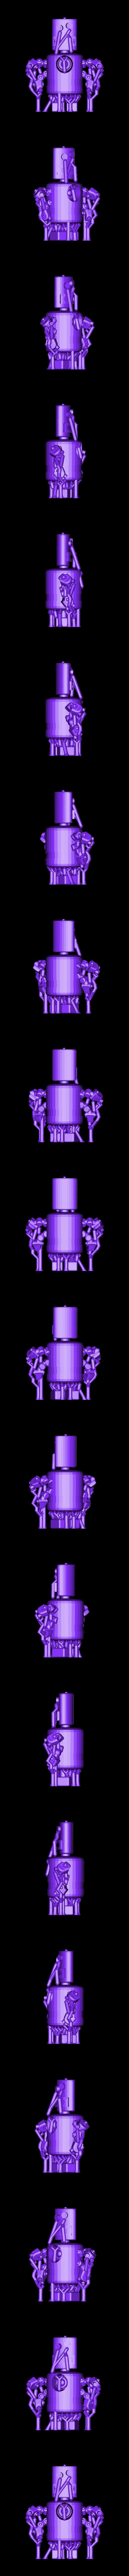 model15_sup.stl Download free STL file Dr Fluff Robot, Flat Freddy • 3D printable design, ThinkerThing